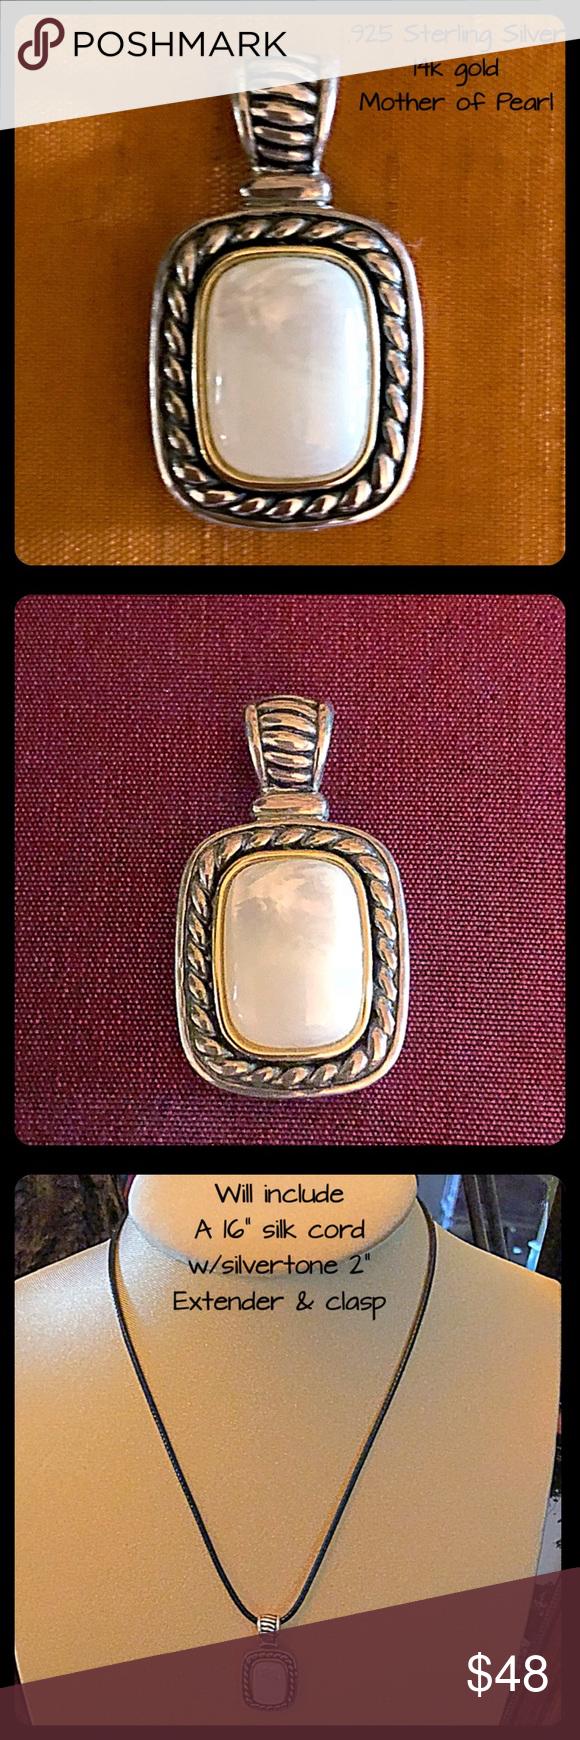 Vtg ss mother of pearl k gold pendant my posh picks